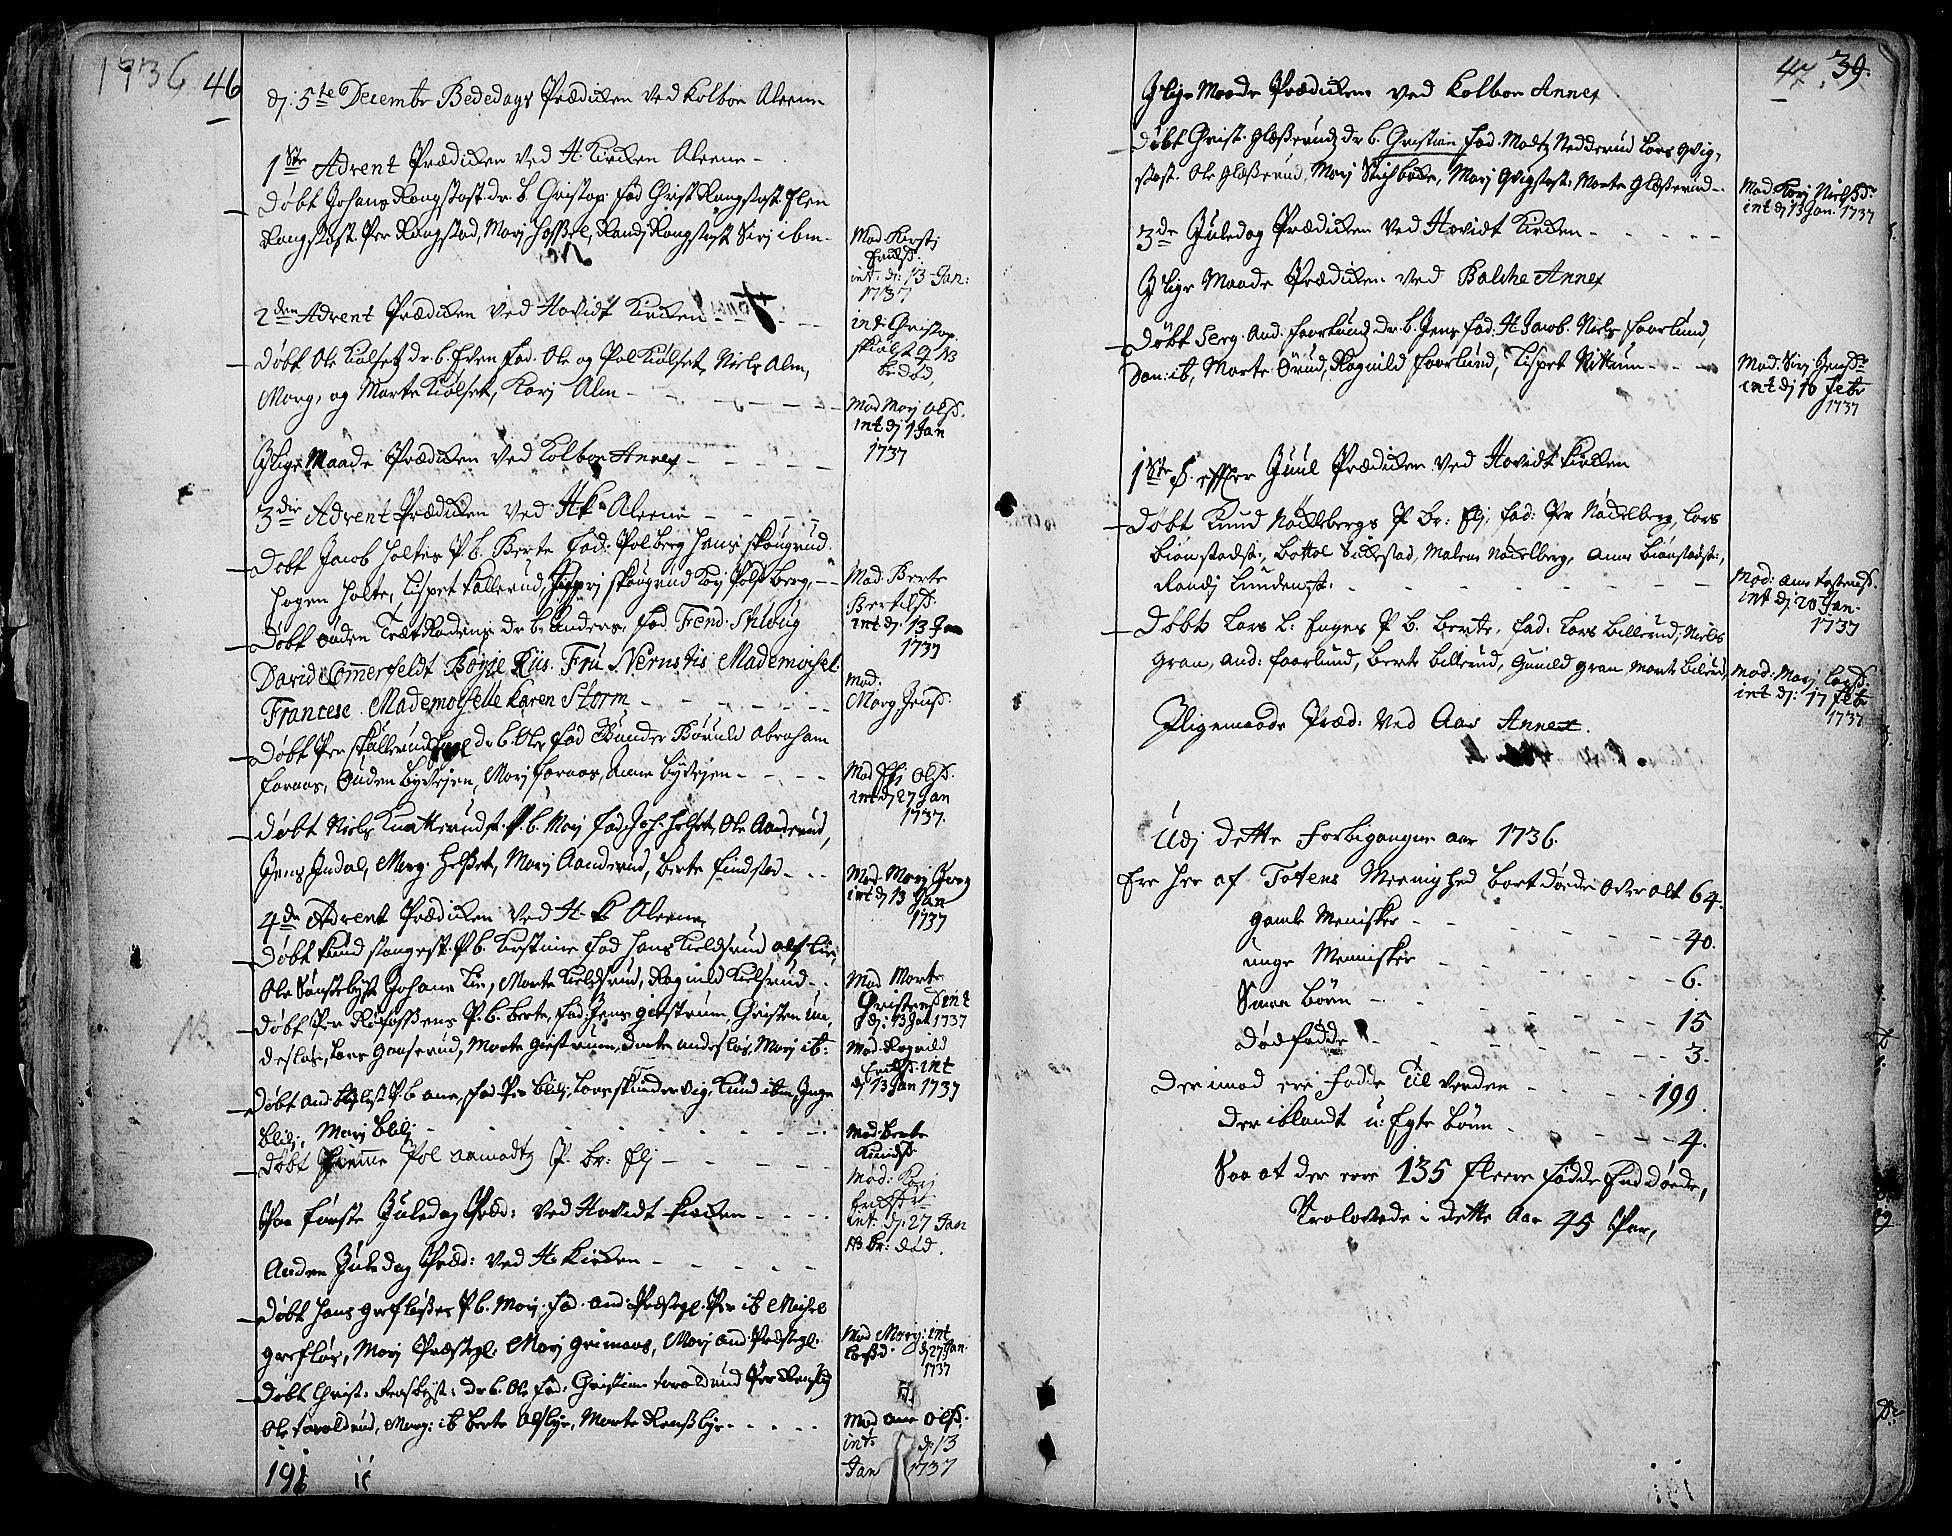 SAH, Toten prestekontor, Ministerialbok nr. 3, 1734-1751, s. 46-47